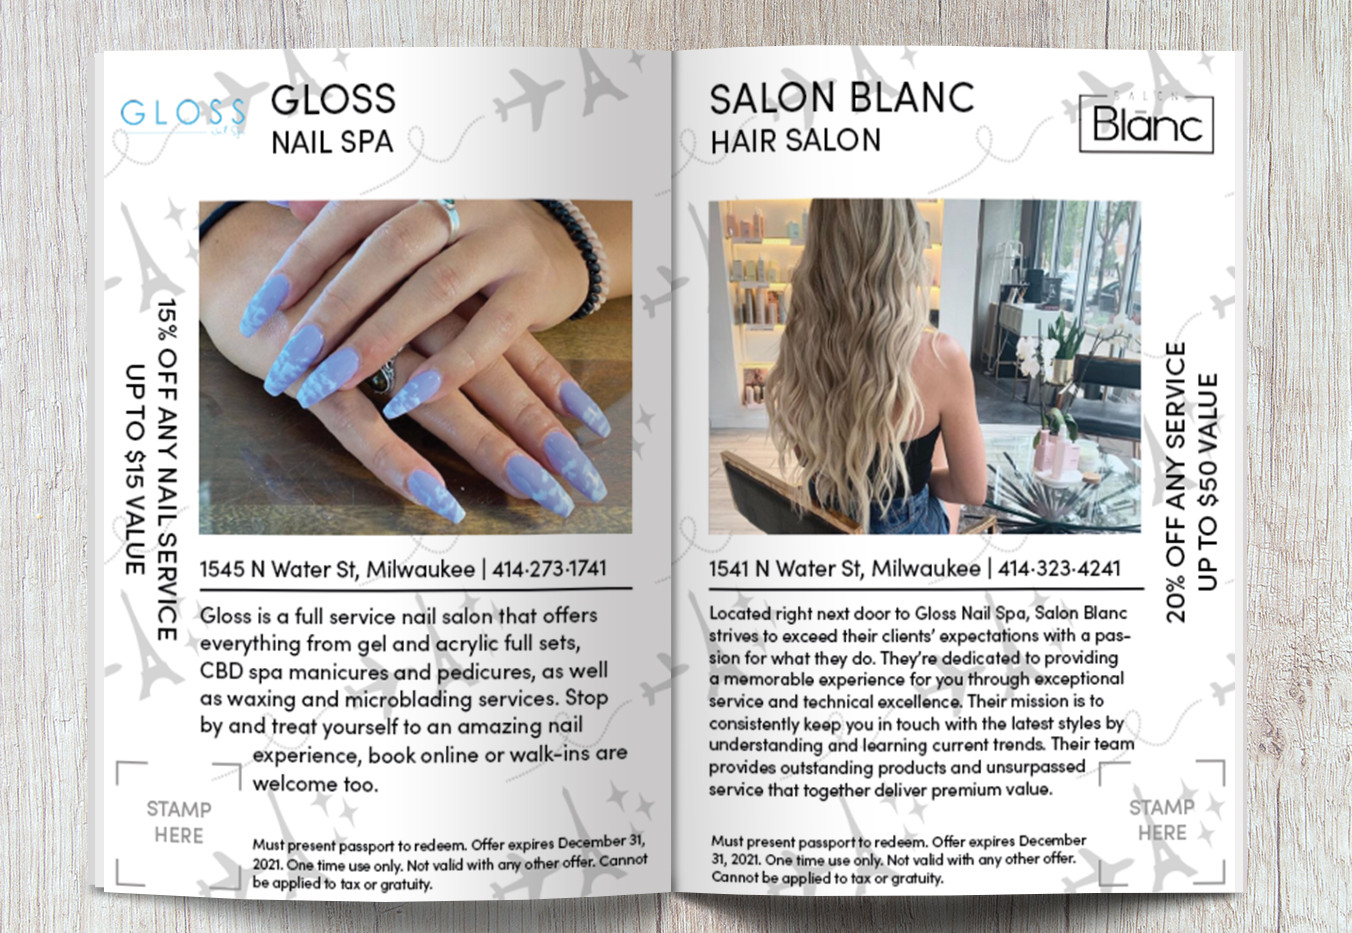 gloss_blanc.jpg